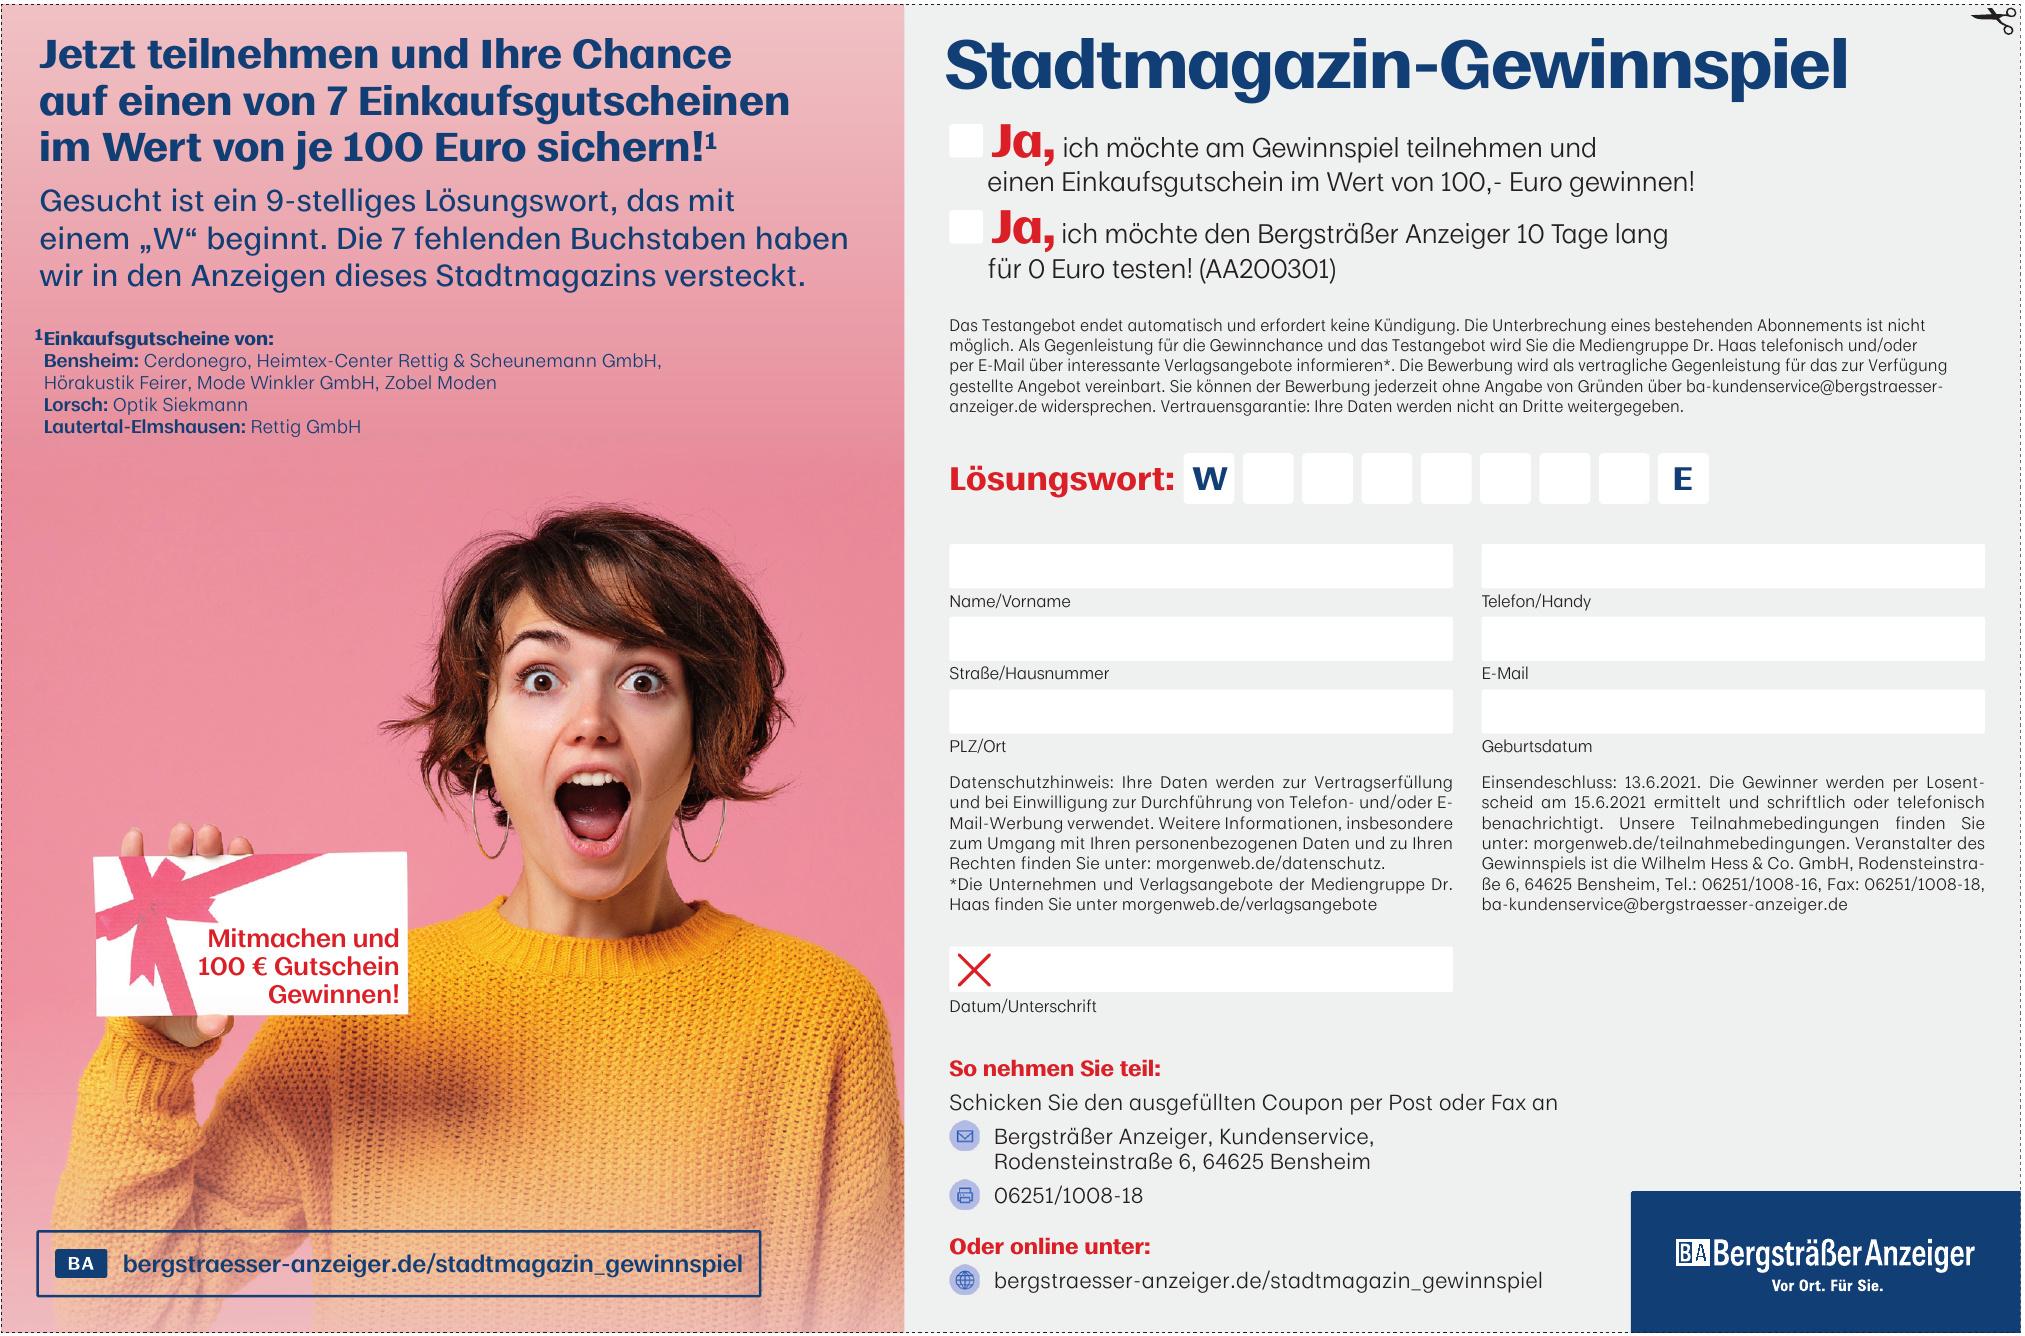 Bergsträßer Anzeiger, Kundenservice